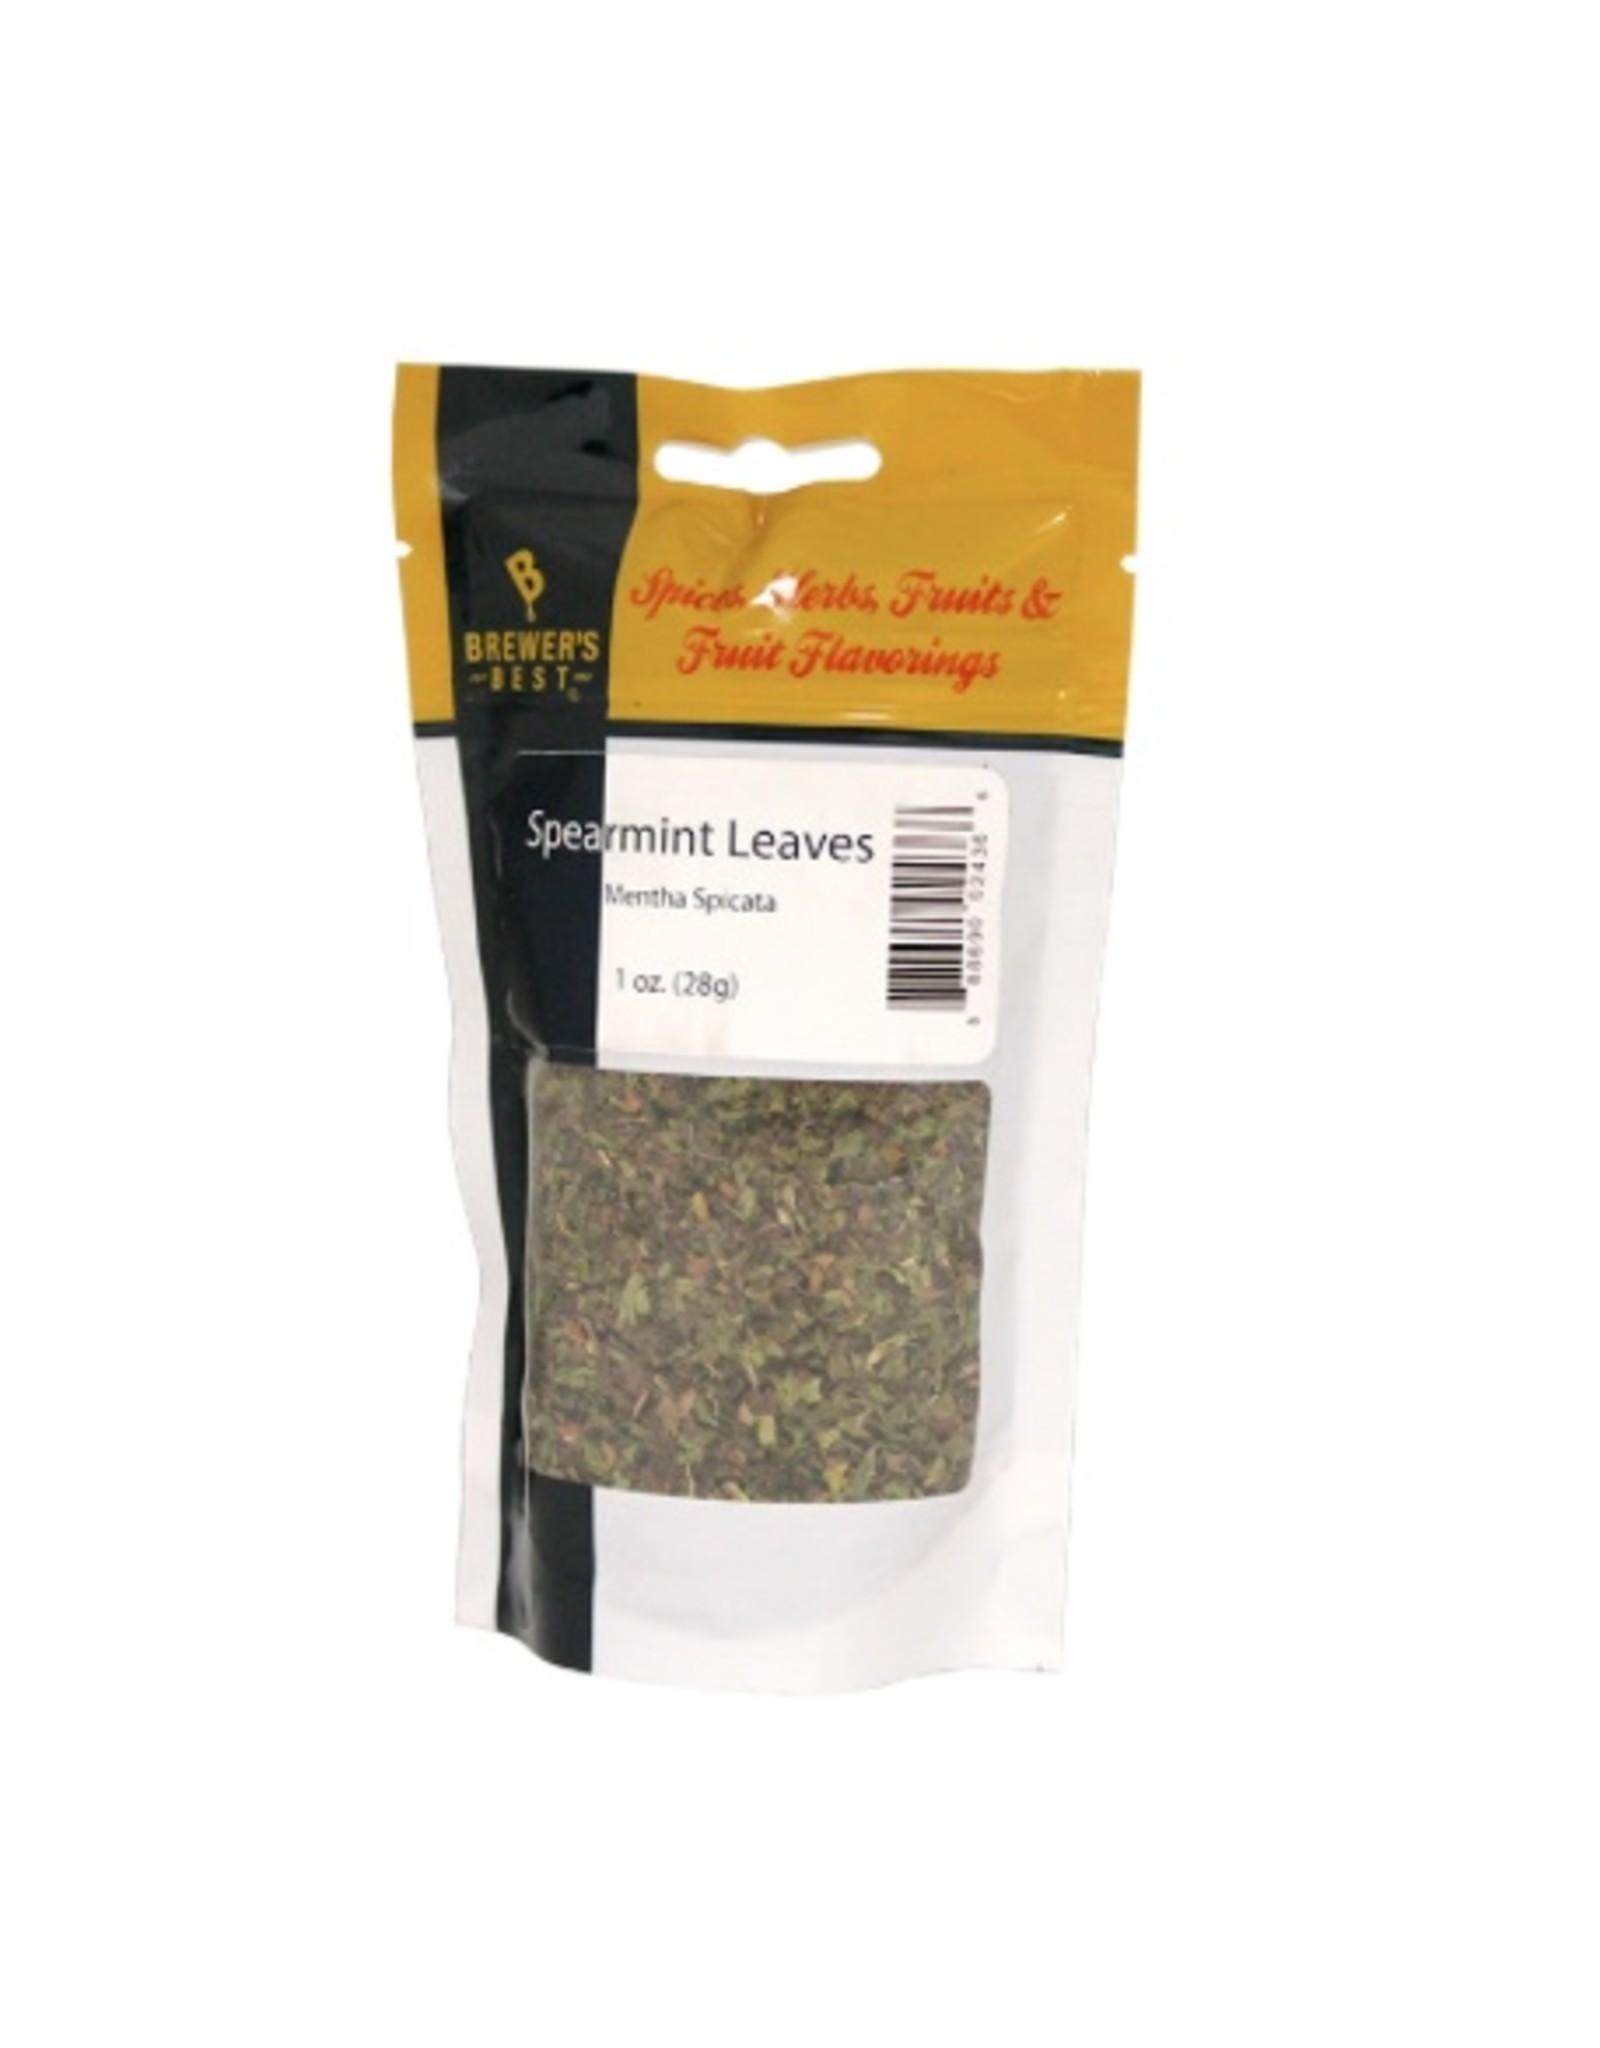 Spearmint Leaves 1 oz